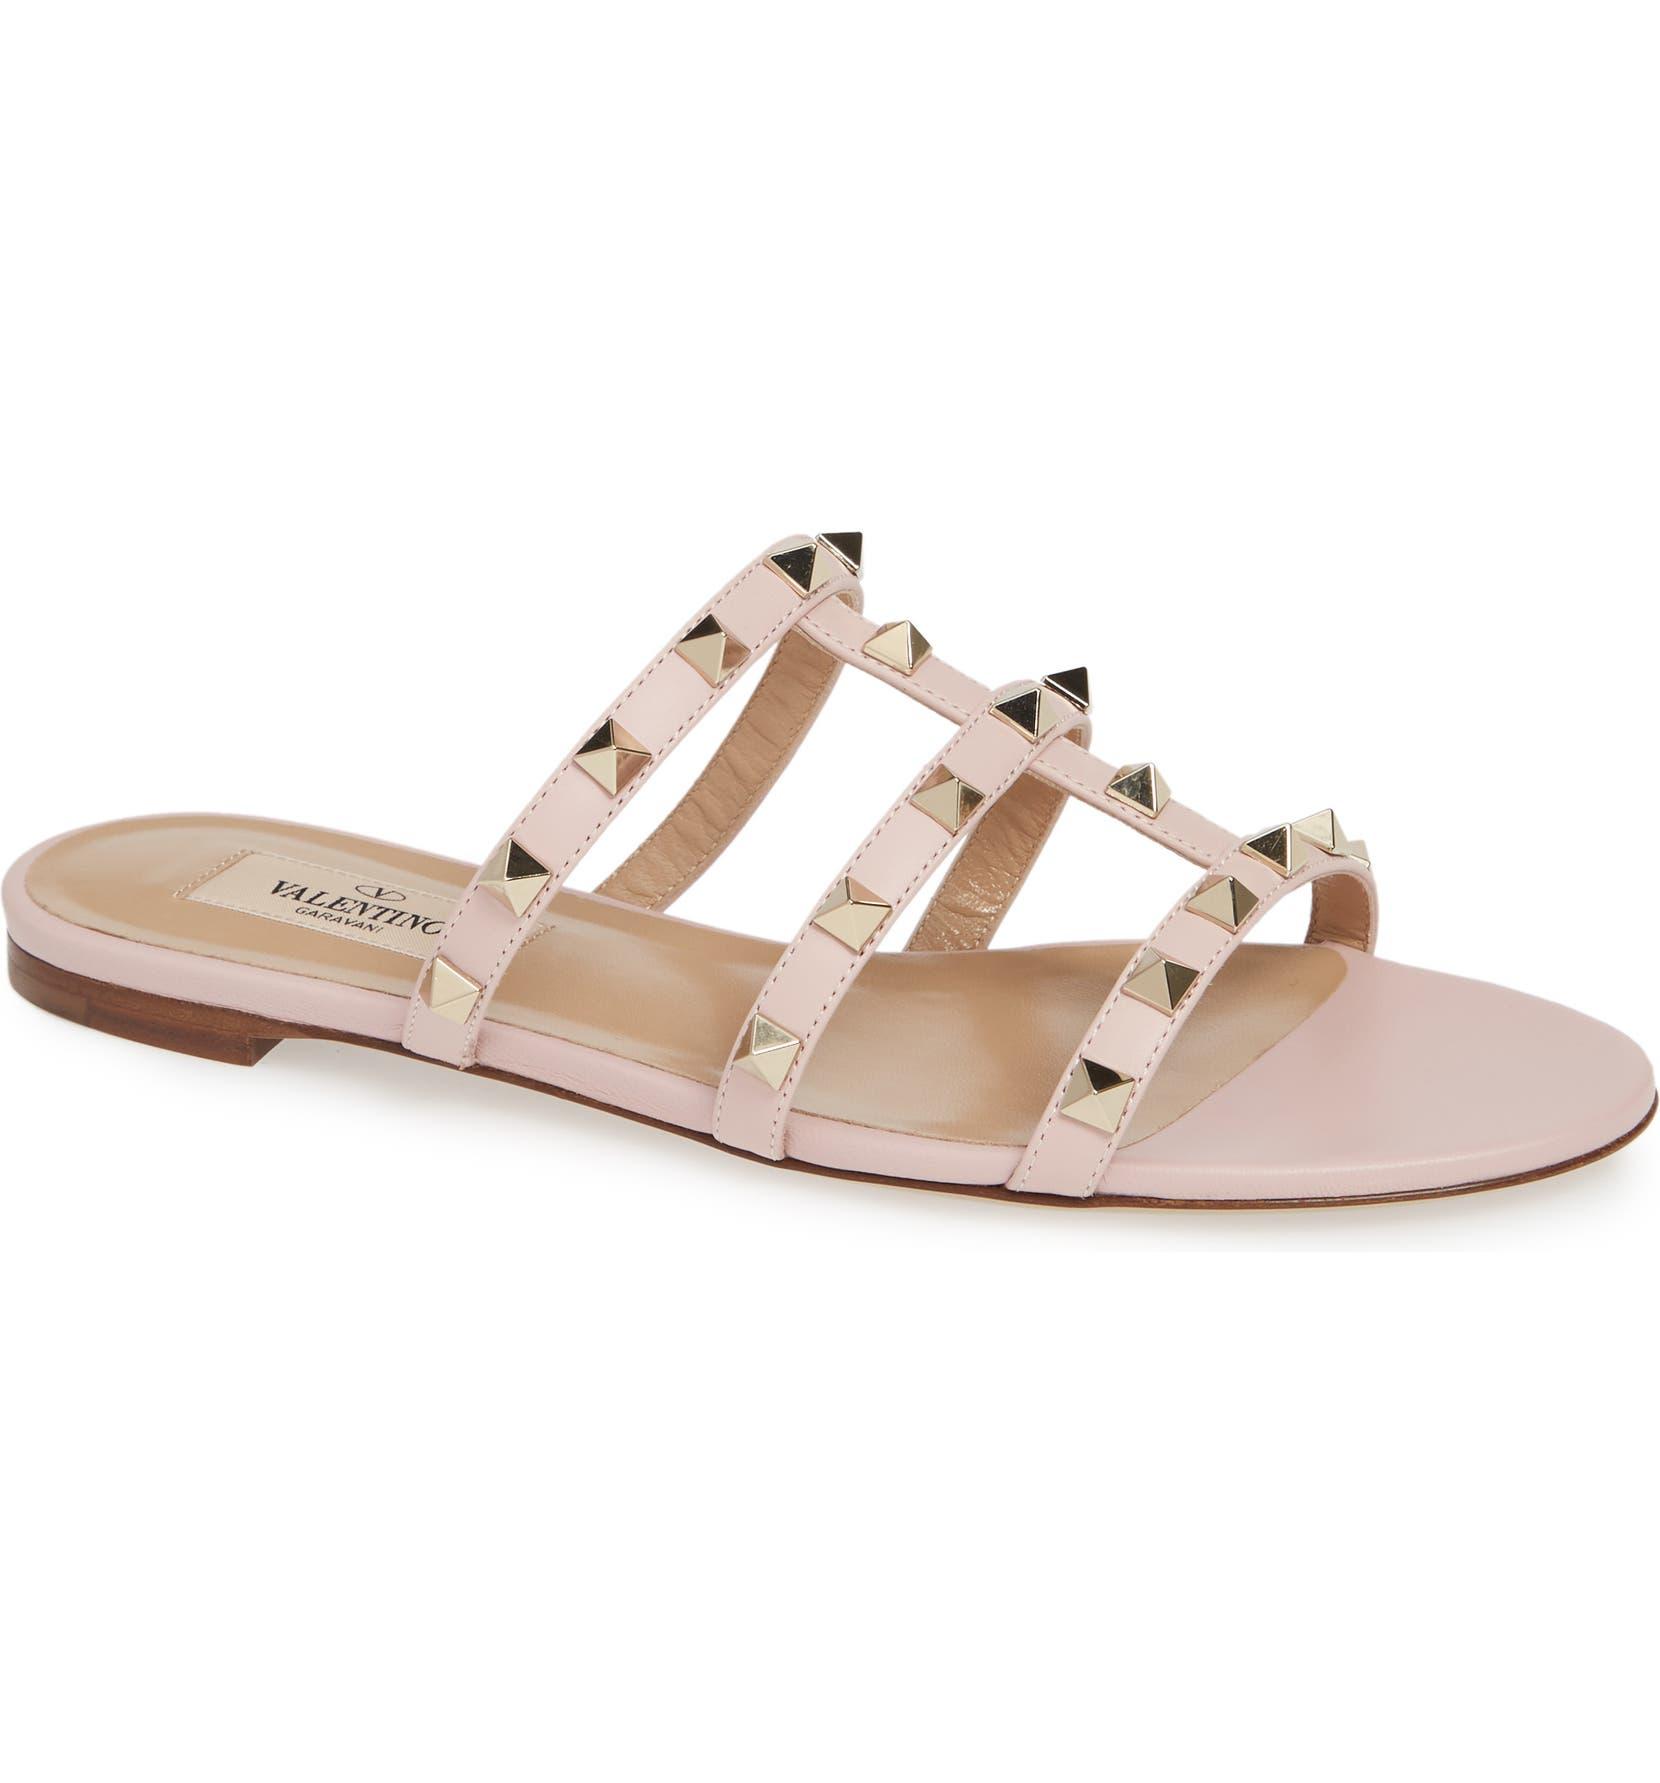 2fc0731937 VALENTINO GARAVANI Rockstud Slide Sandal (Women) | Nordstrom